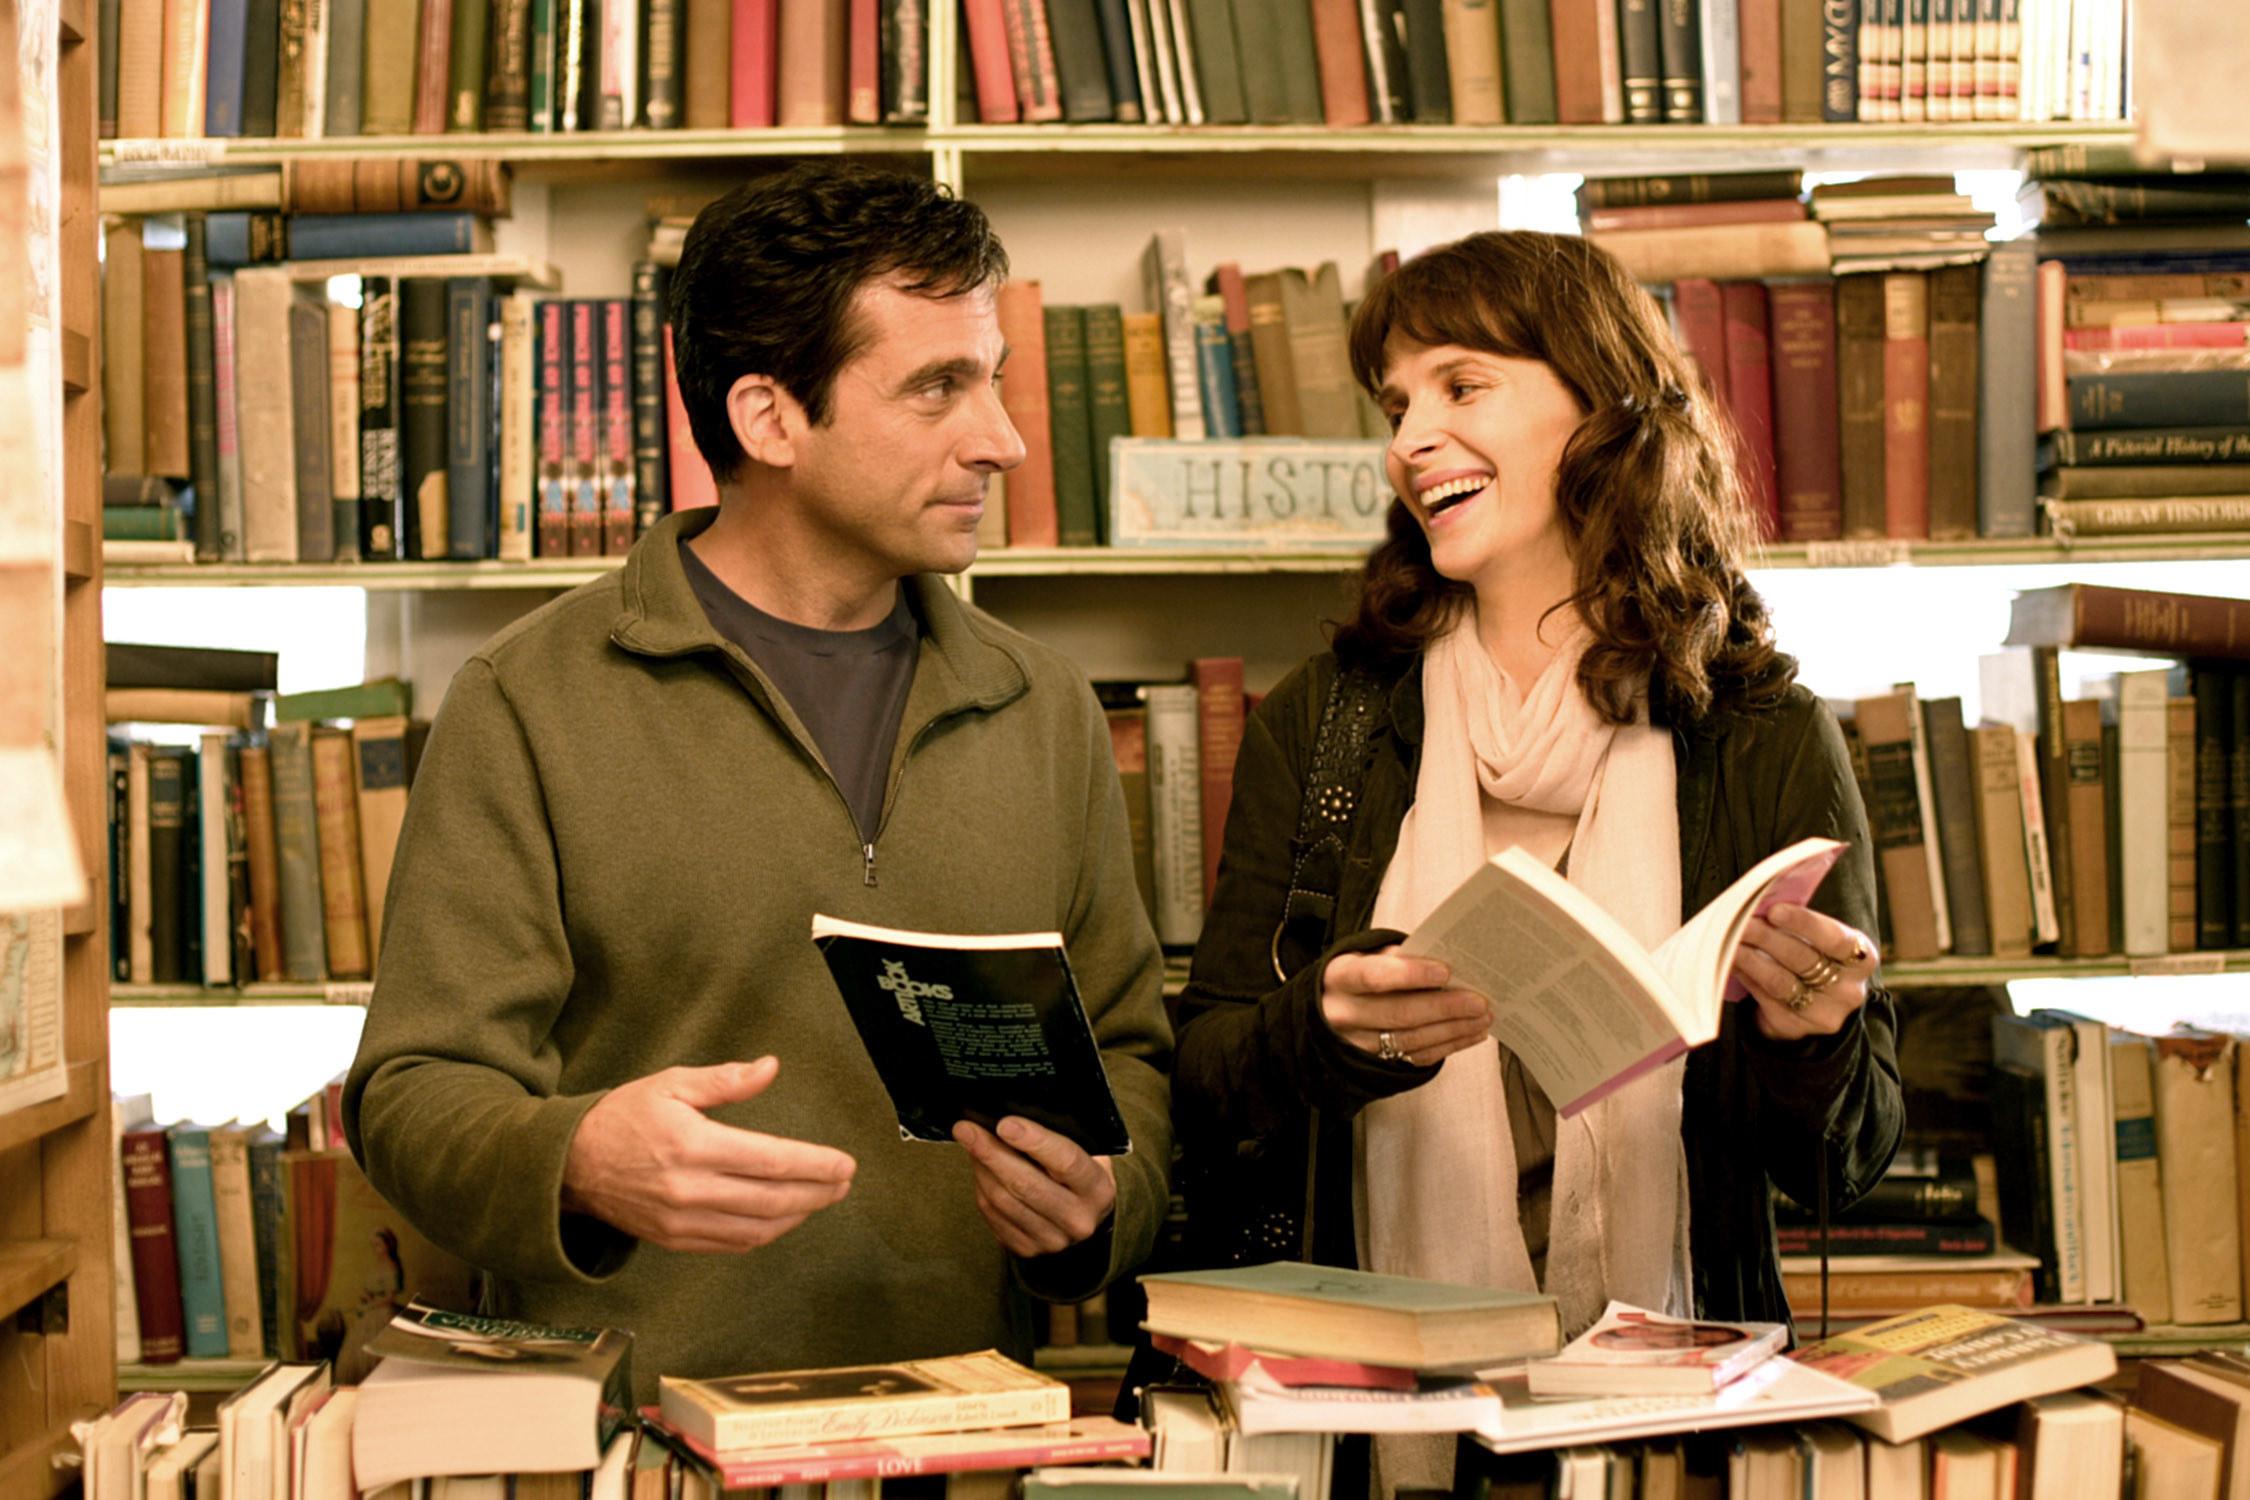 Steve Carell and Juliette Binoche talking about books